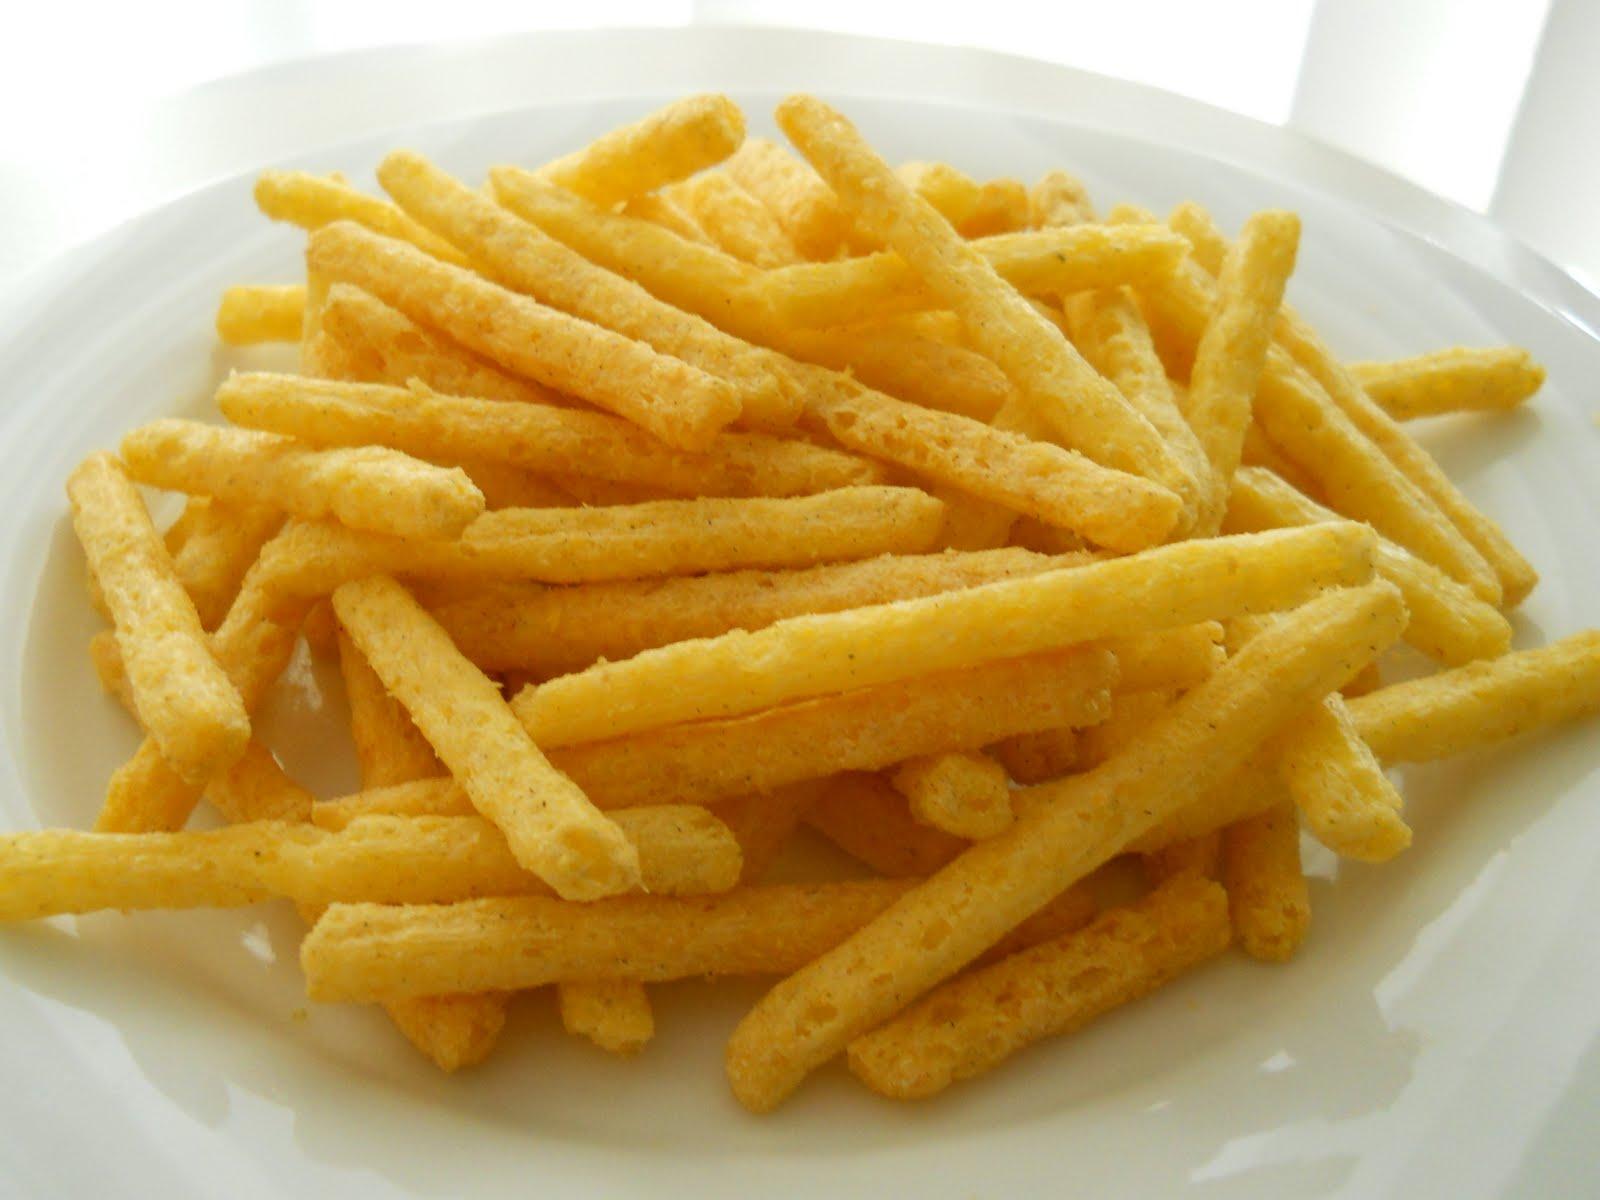 CaféConnie: Snikiddy Baked Fries